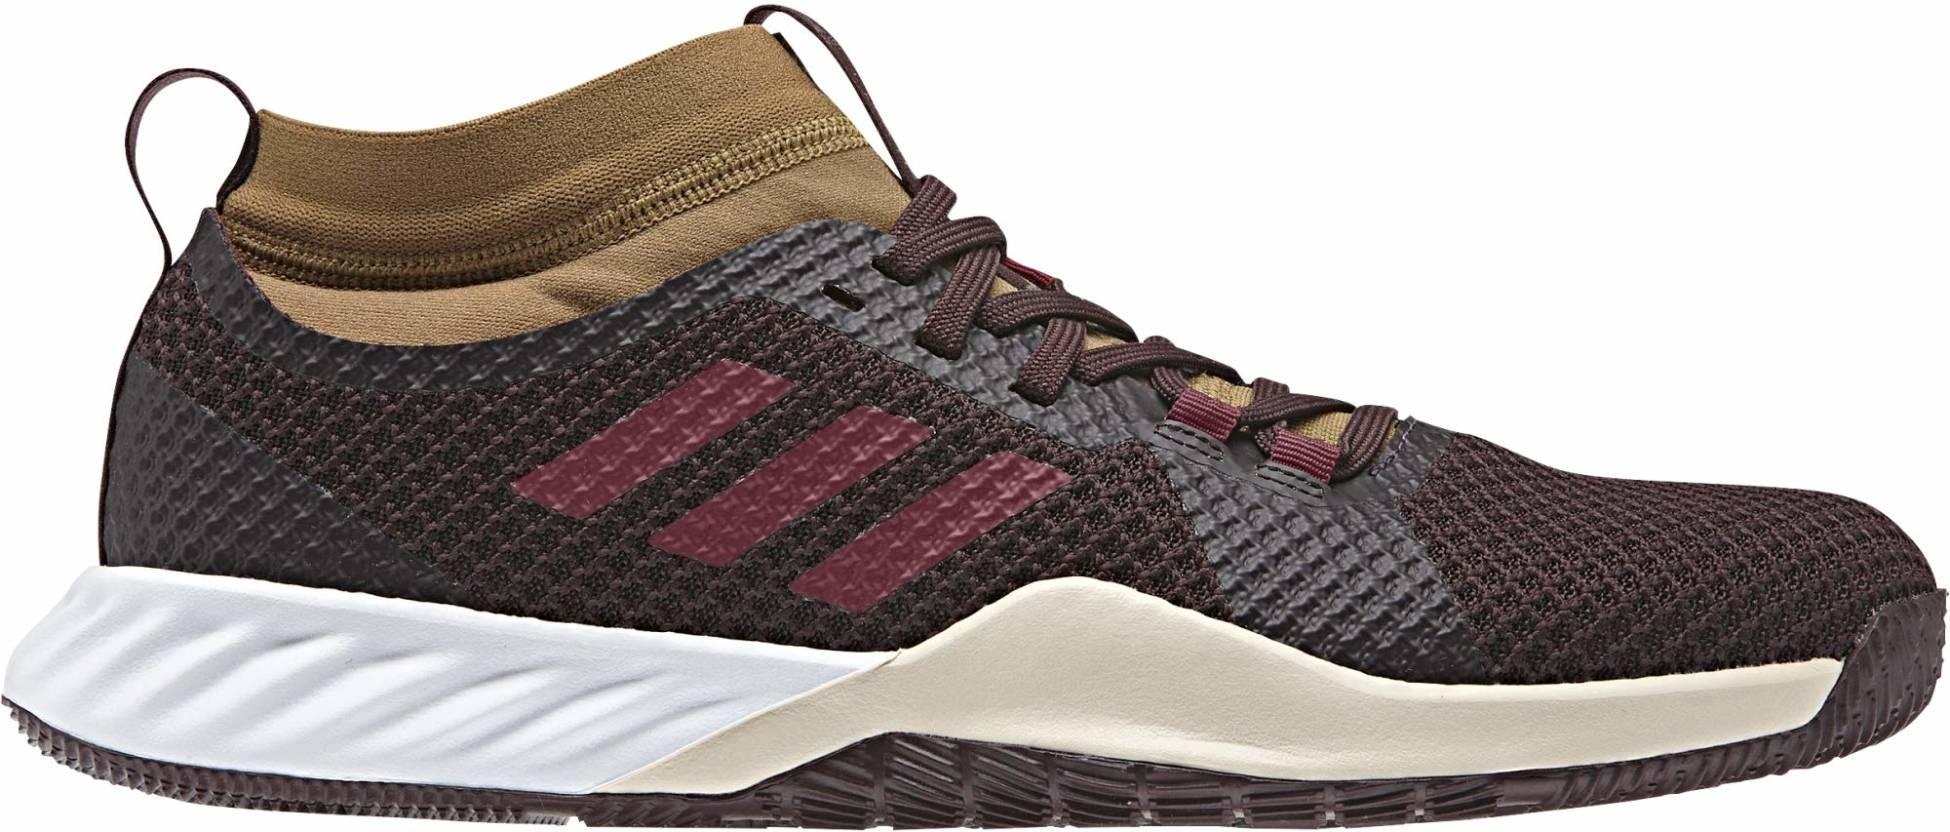 20 Adidas training shoes - Save 49% | RunRepeat